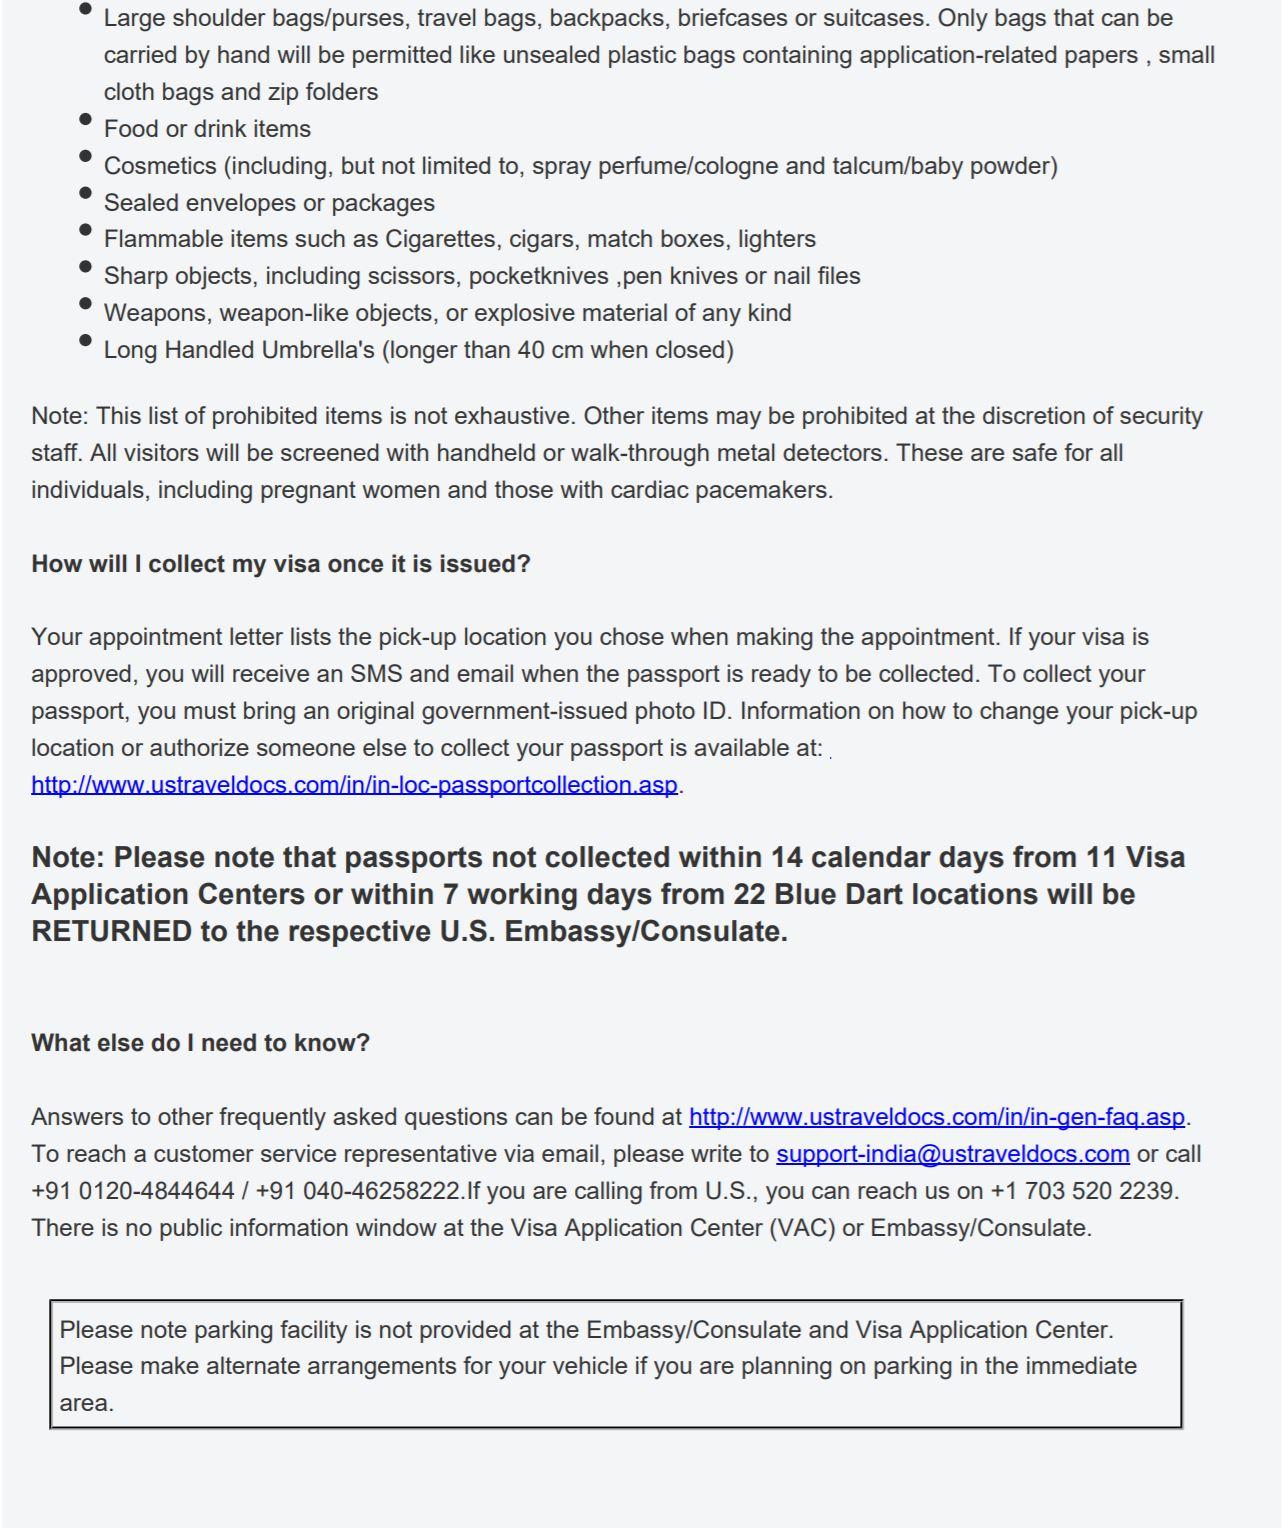 US Visa Appointment FAQs Part 2